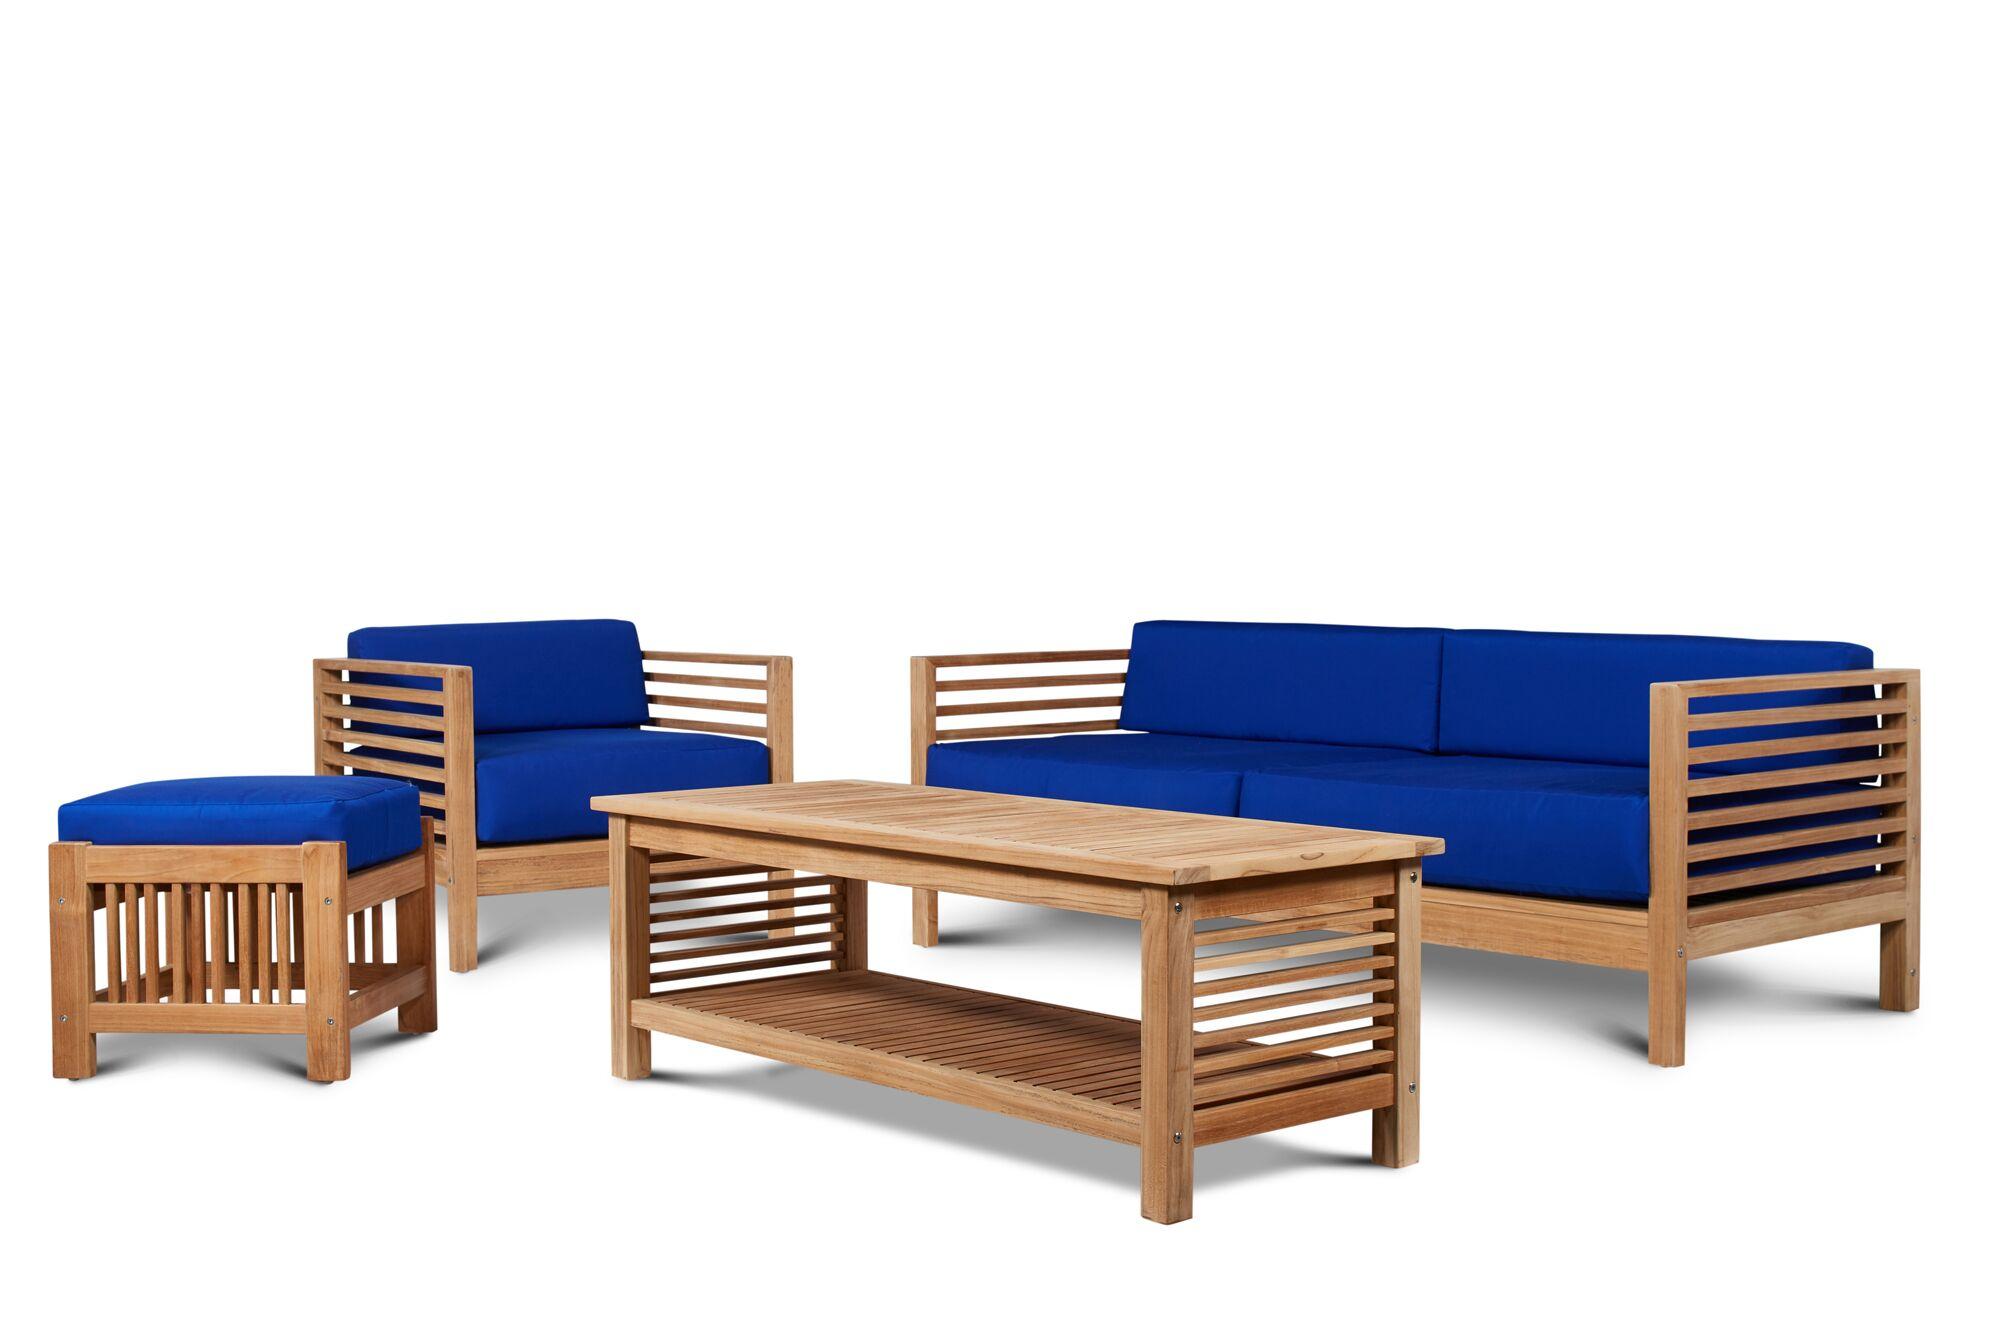 Crider 4 Piece Teak Sunbrella Sofa Set with Cushions